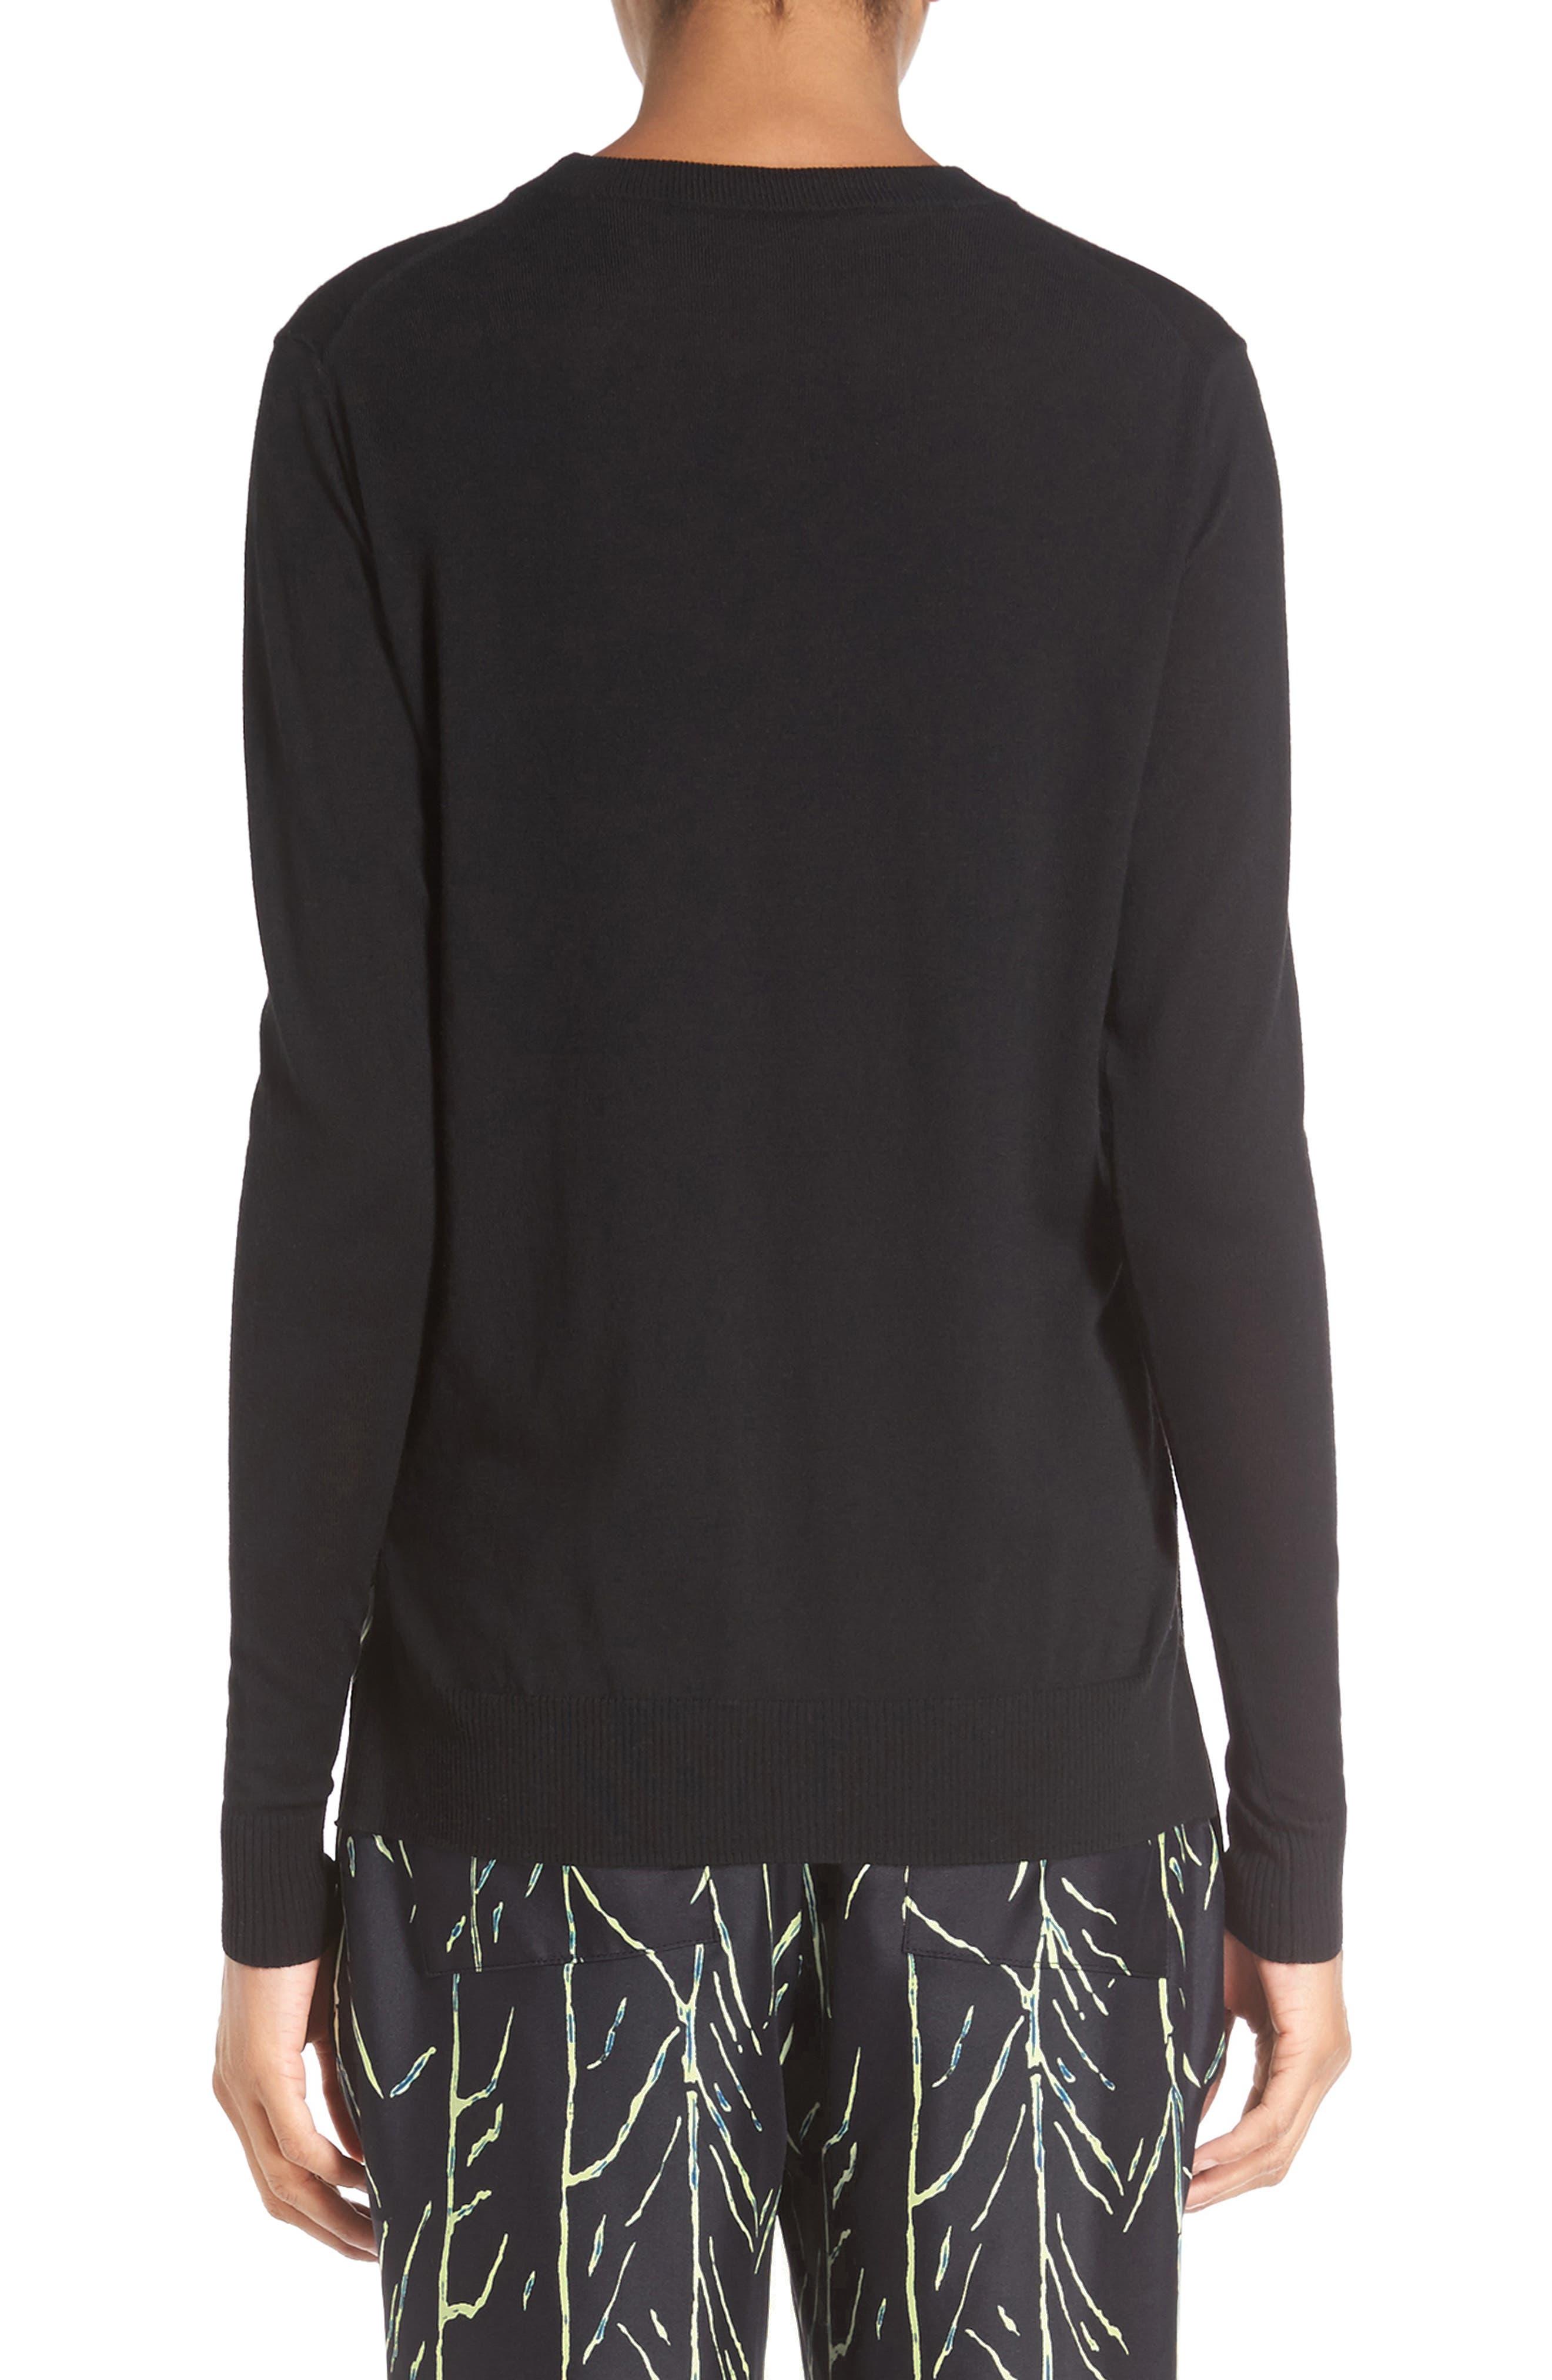 Superfine Merino Wool Sweater,                             Alternate thumbnail 3, color,                             001